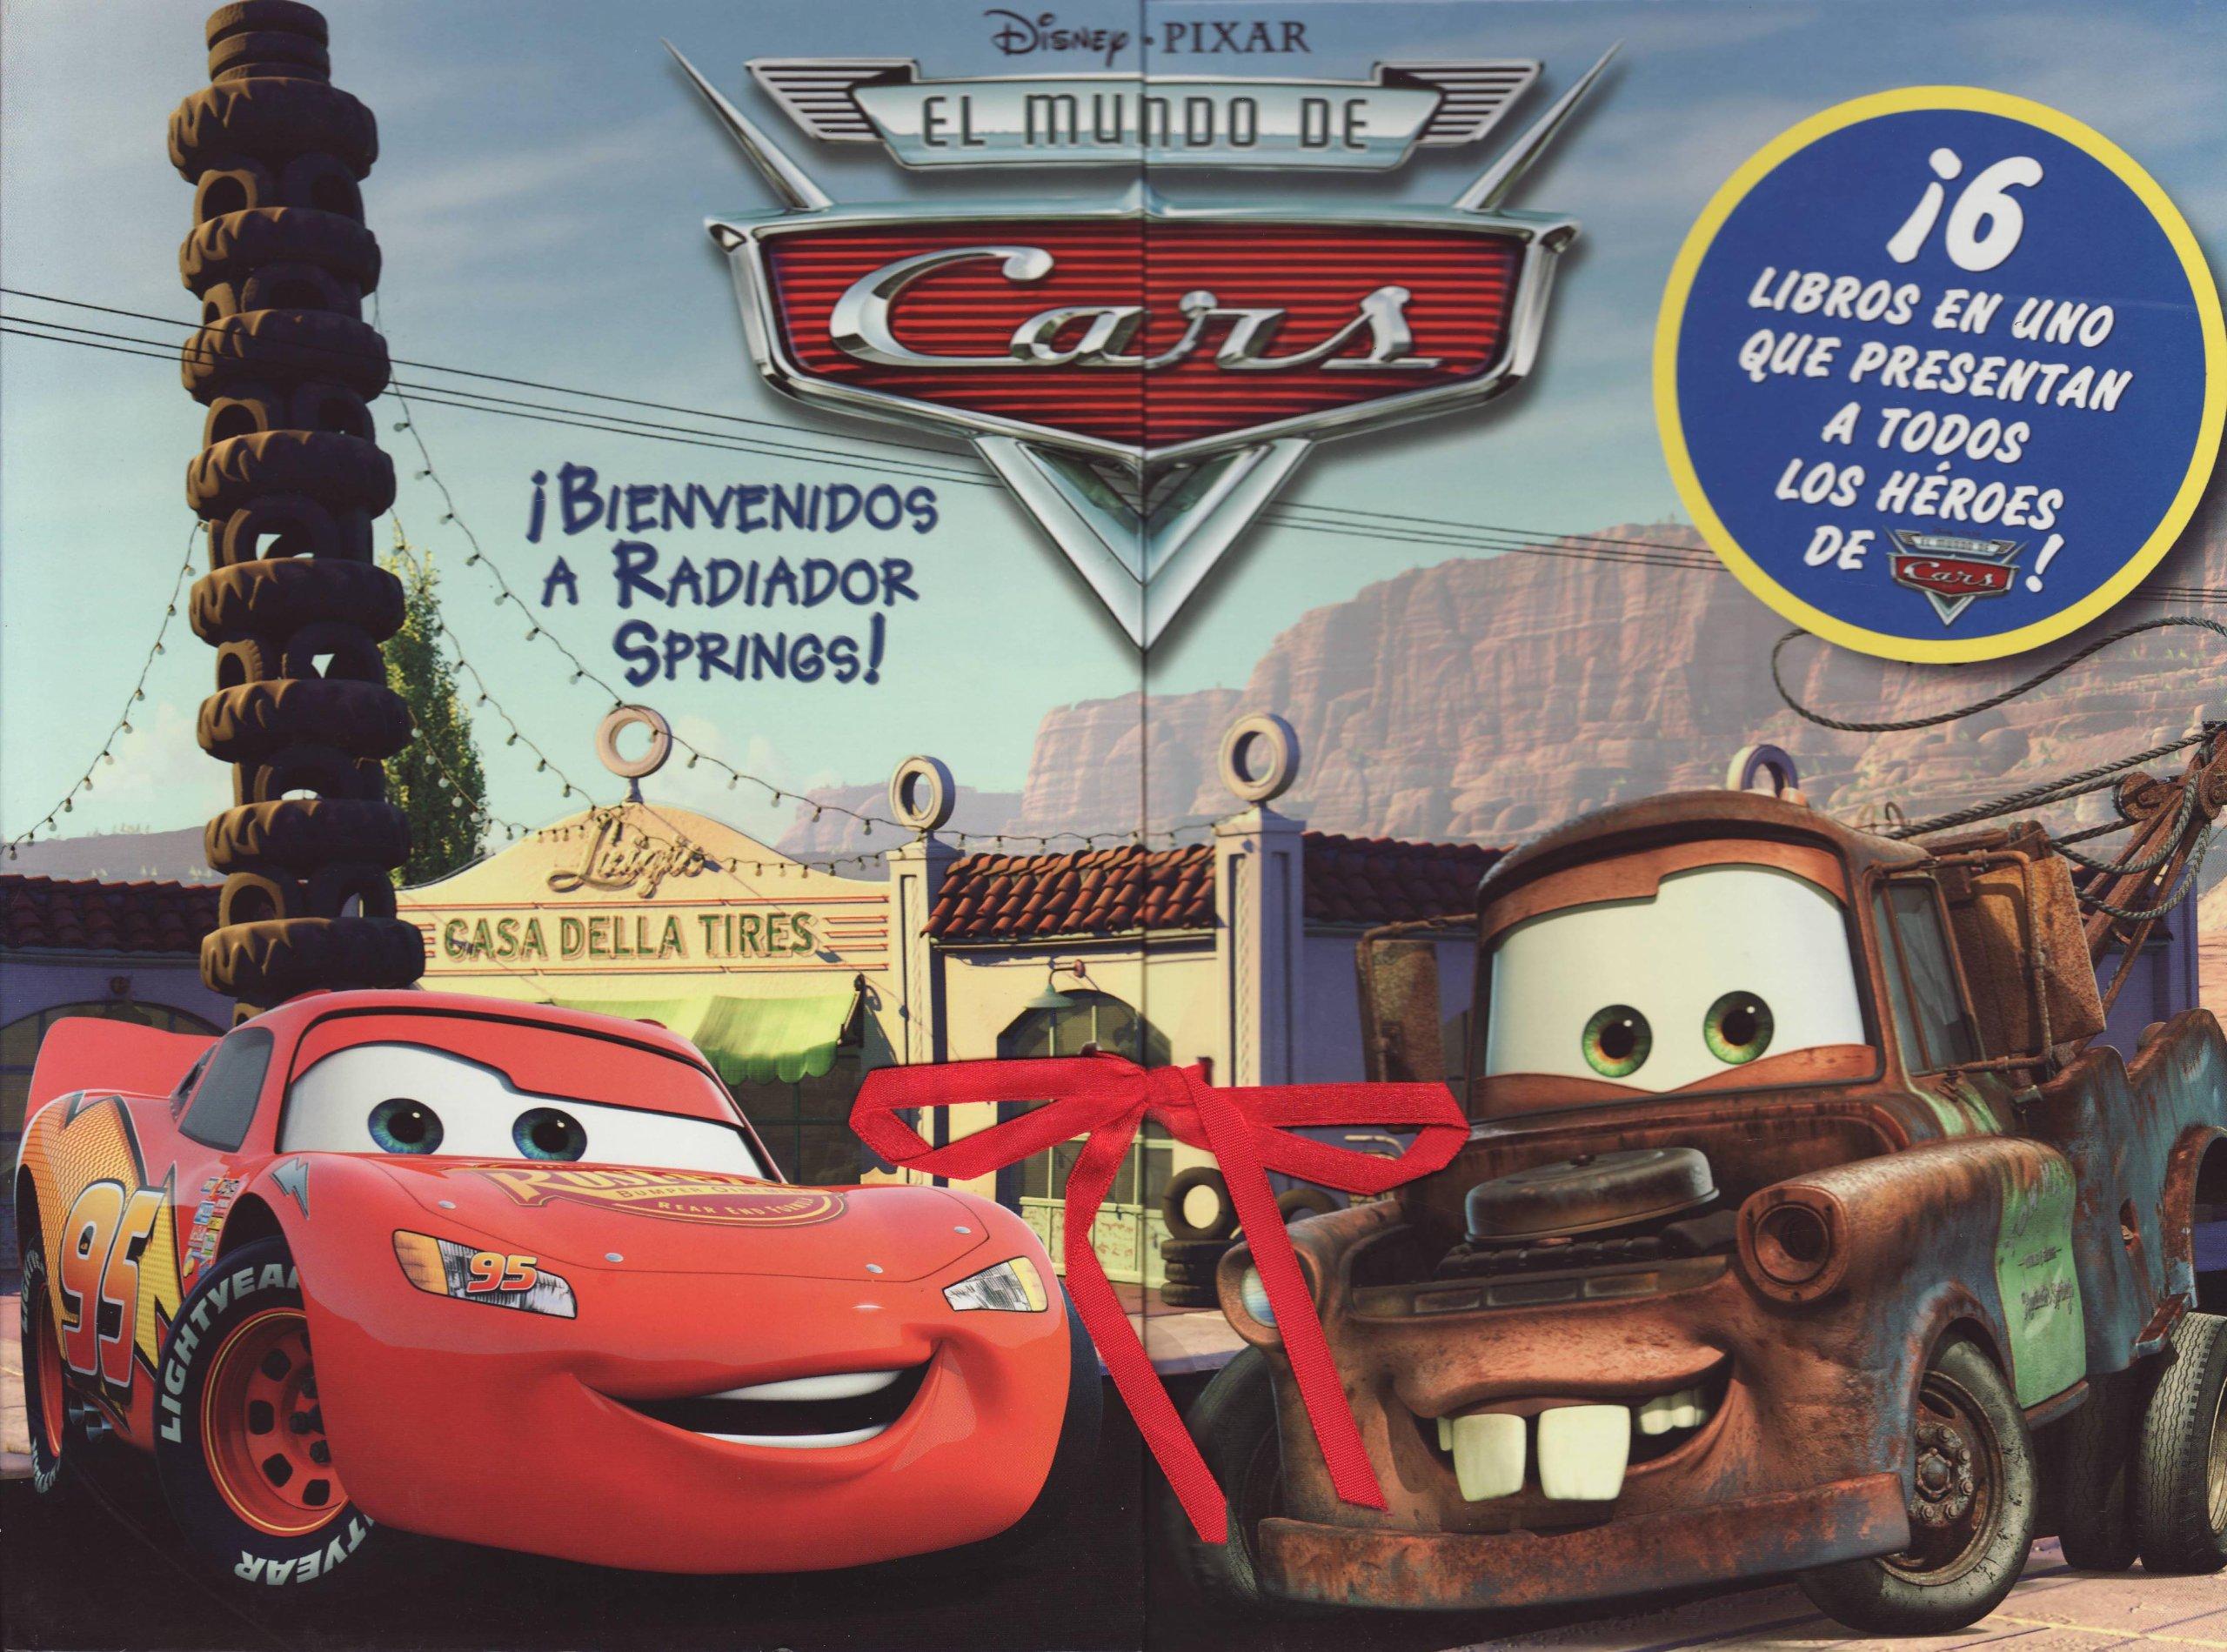 Bienvenidos a Radiador Springs / Welcome to Radiator Springs (El mundo de cars/ The Car's World) (Spanish Edition) ebook